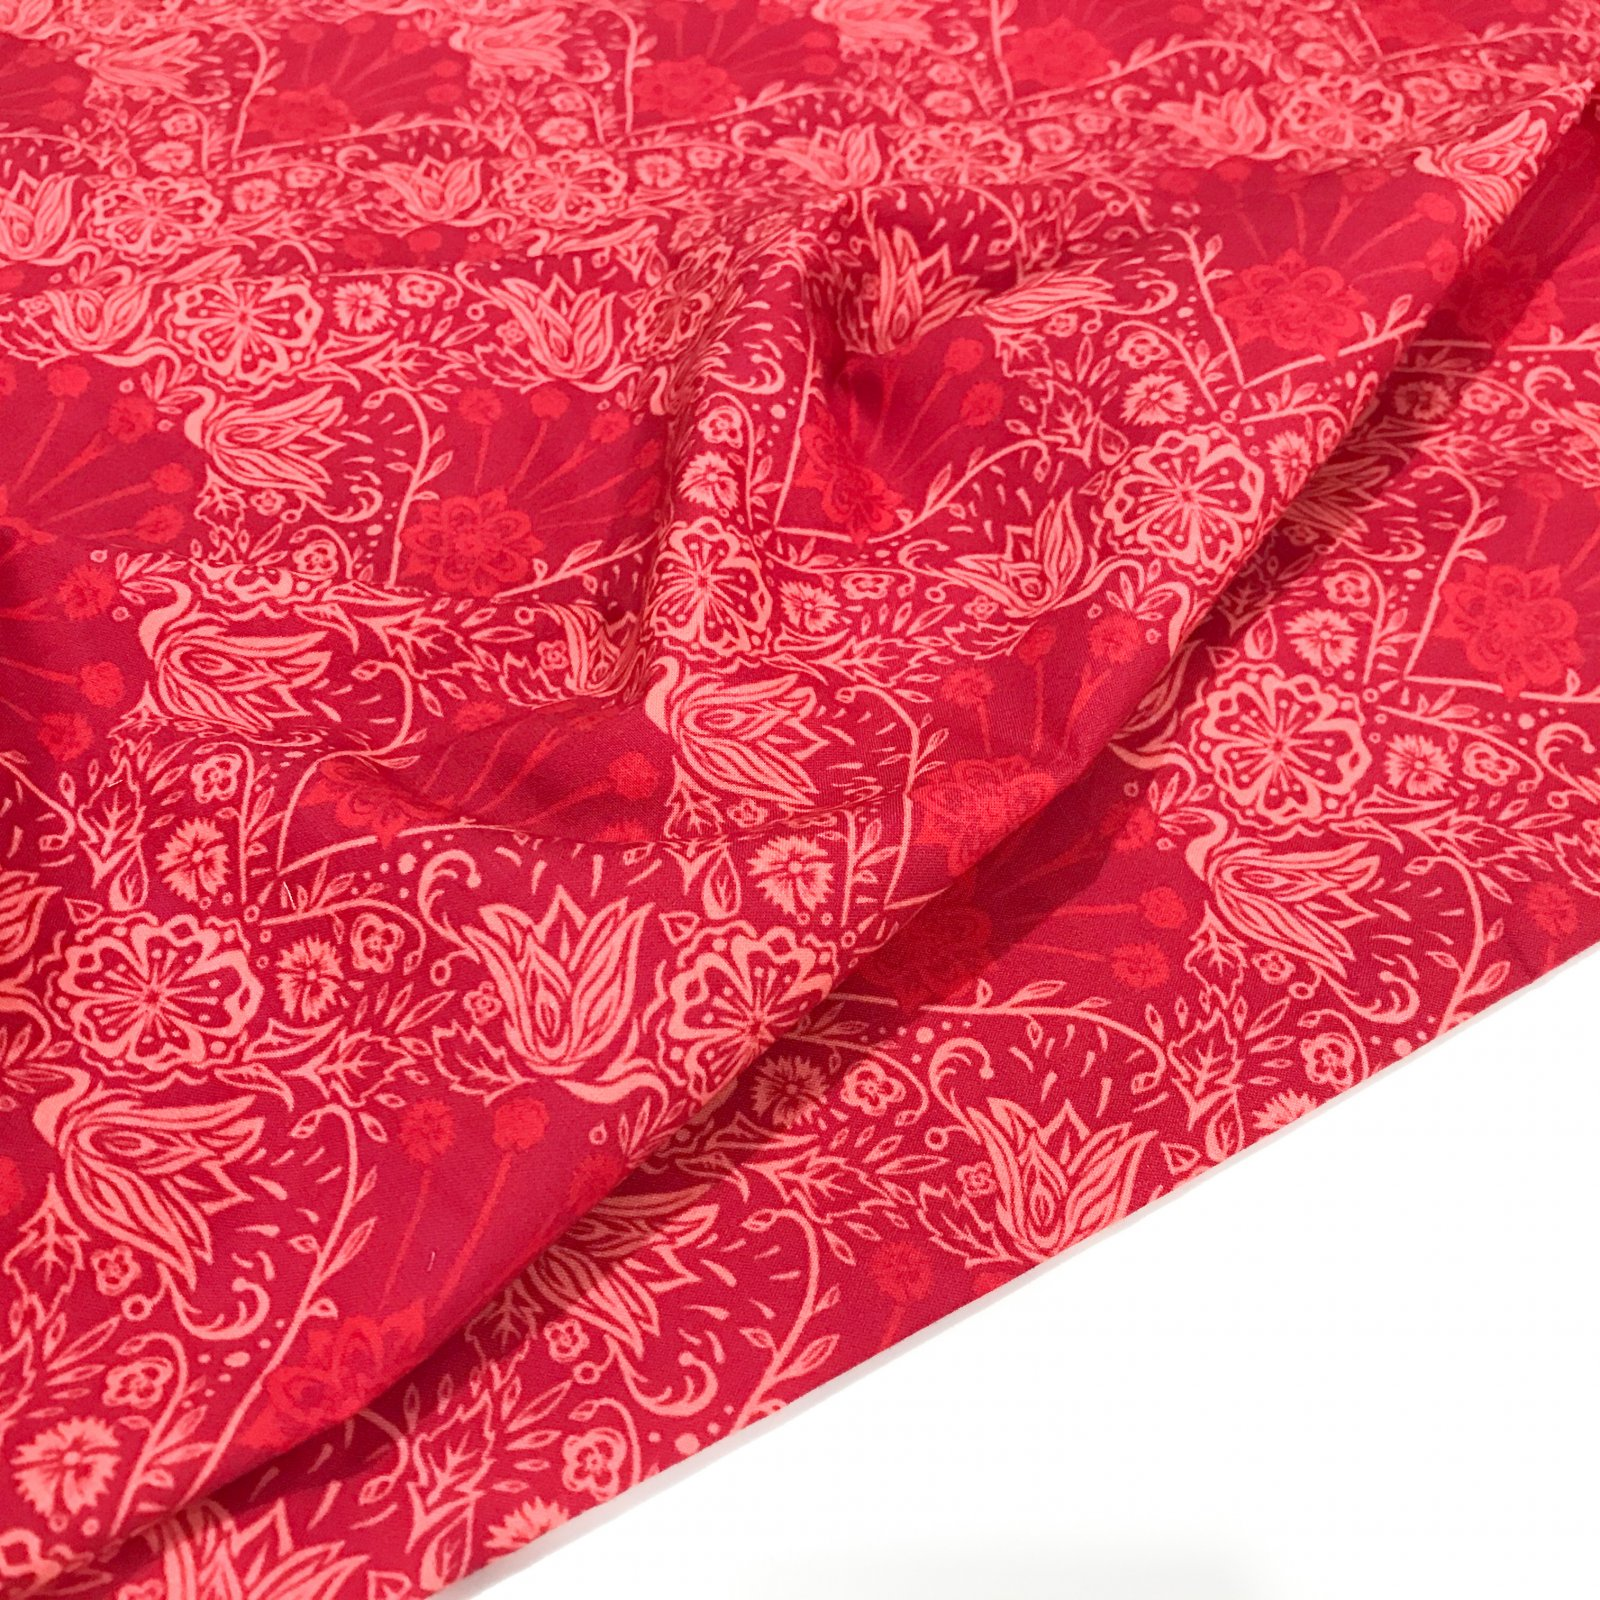 100% Organic Cotton Poplin -  Blooming Garland - Red